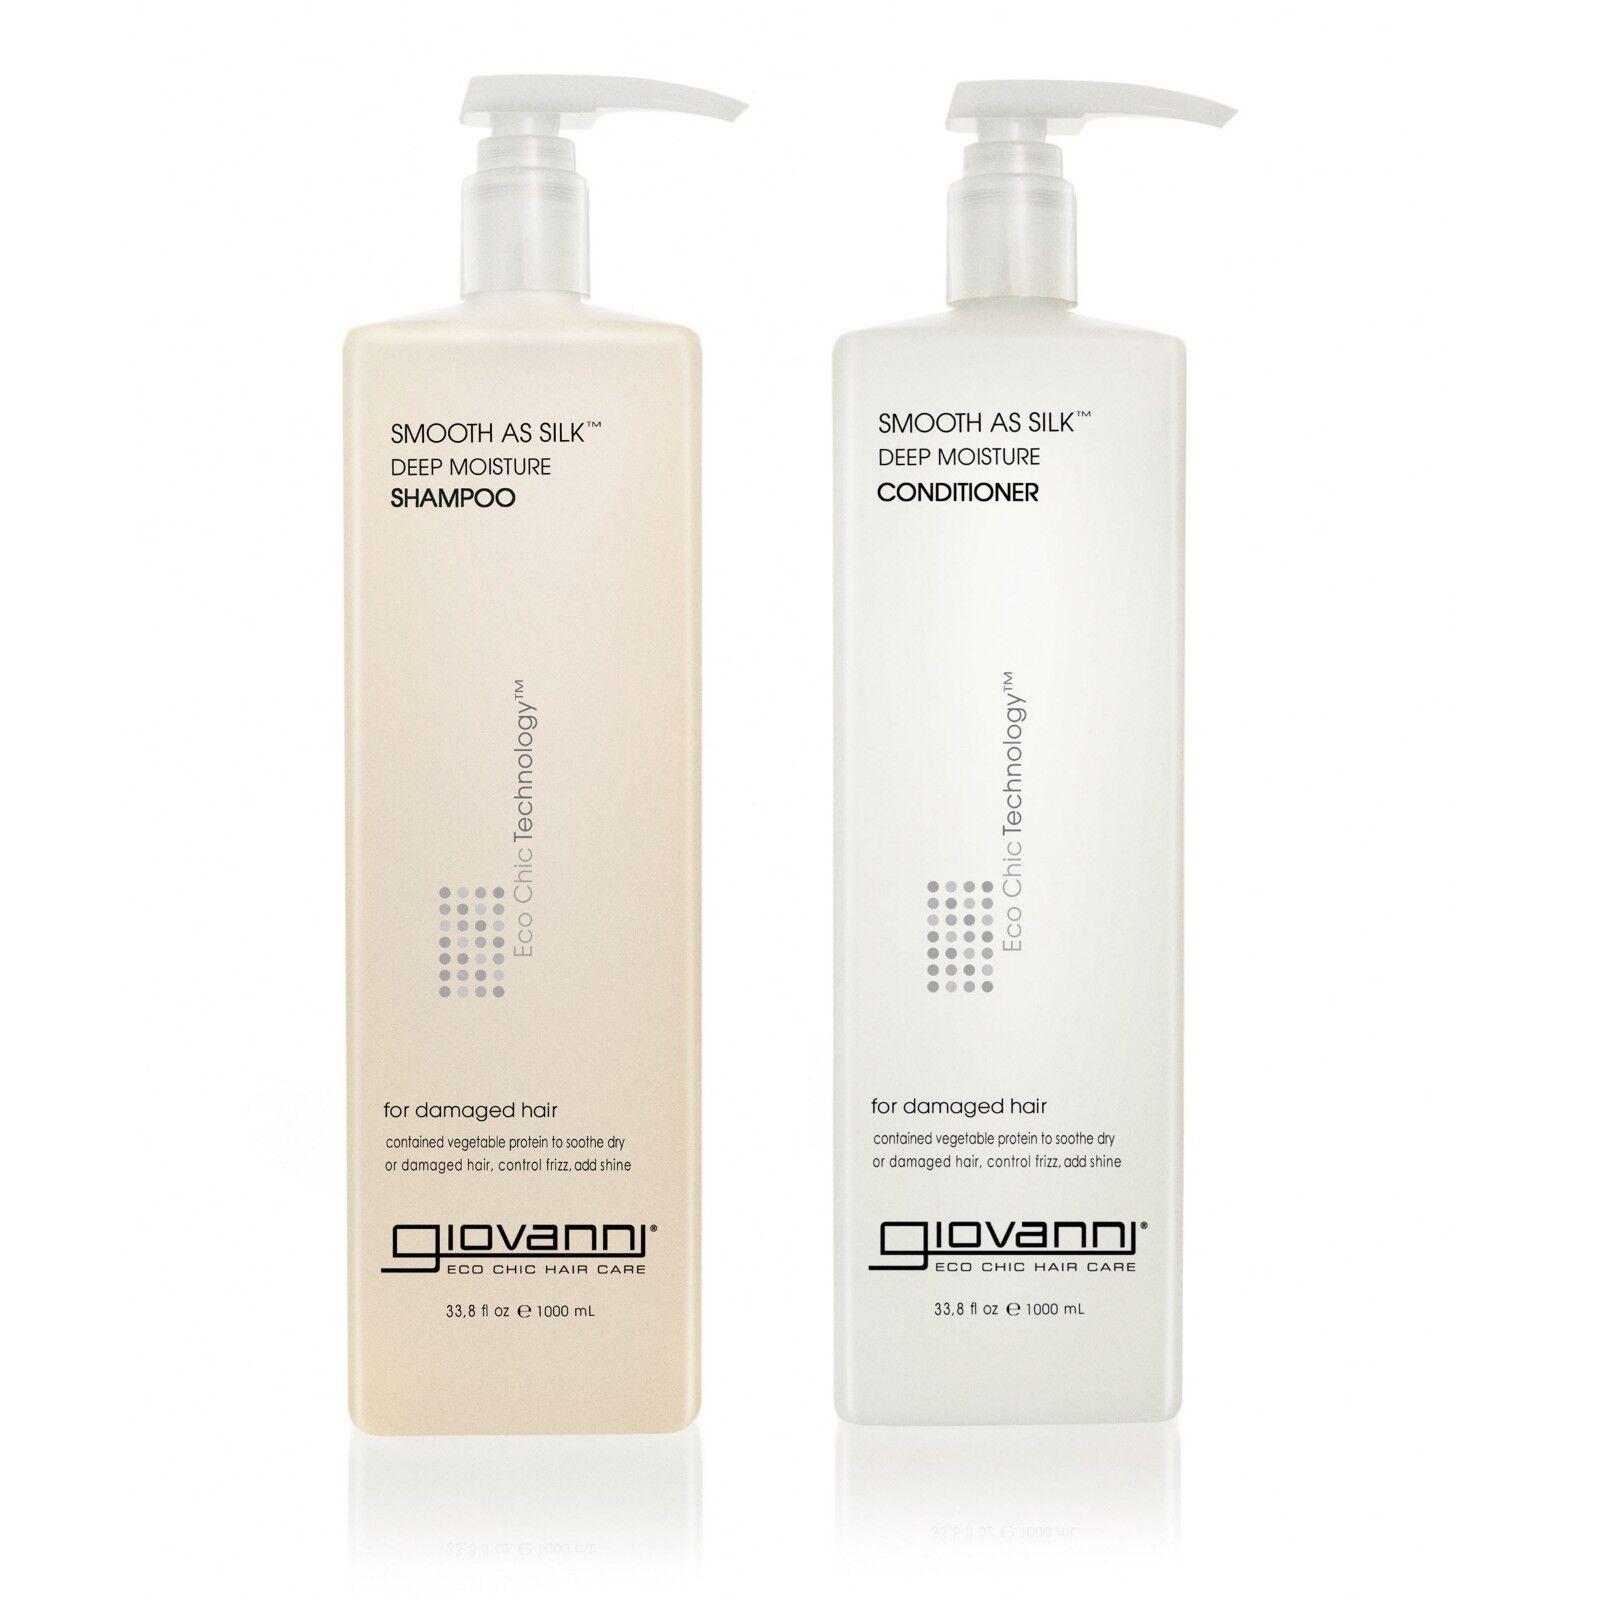 Giovanni Cosmetics Smooth As Silk Deep Moisture Shampoo, 33.